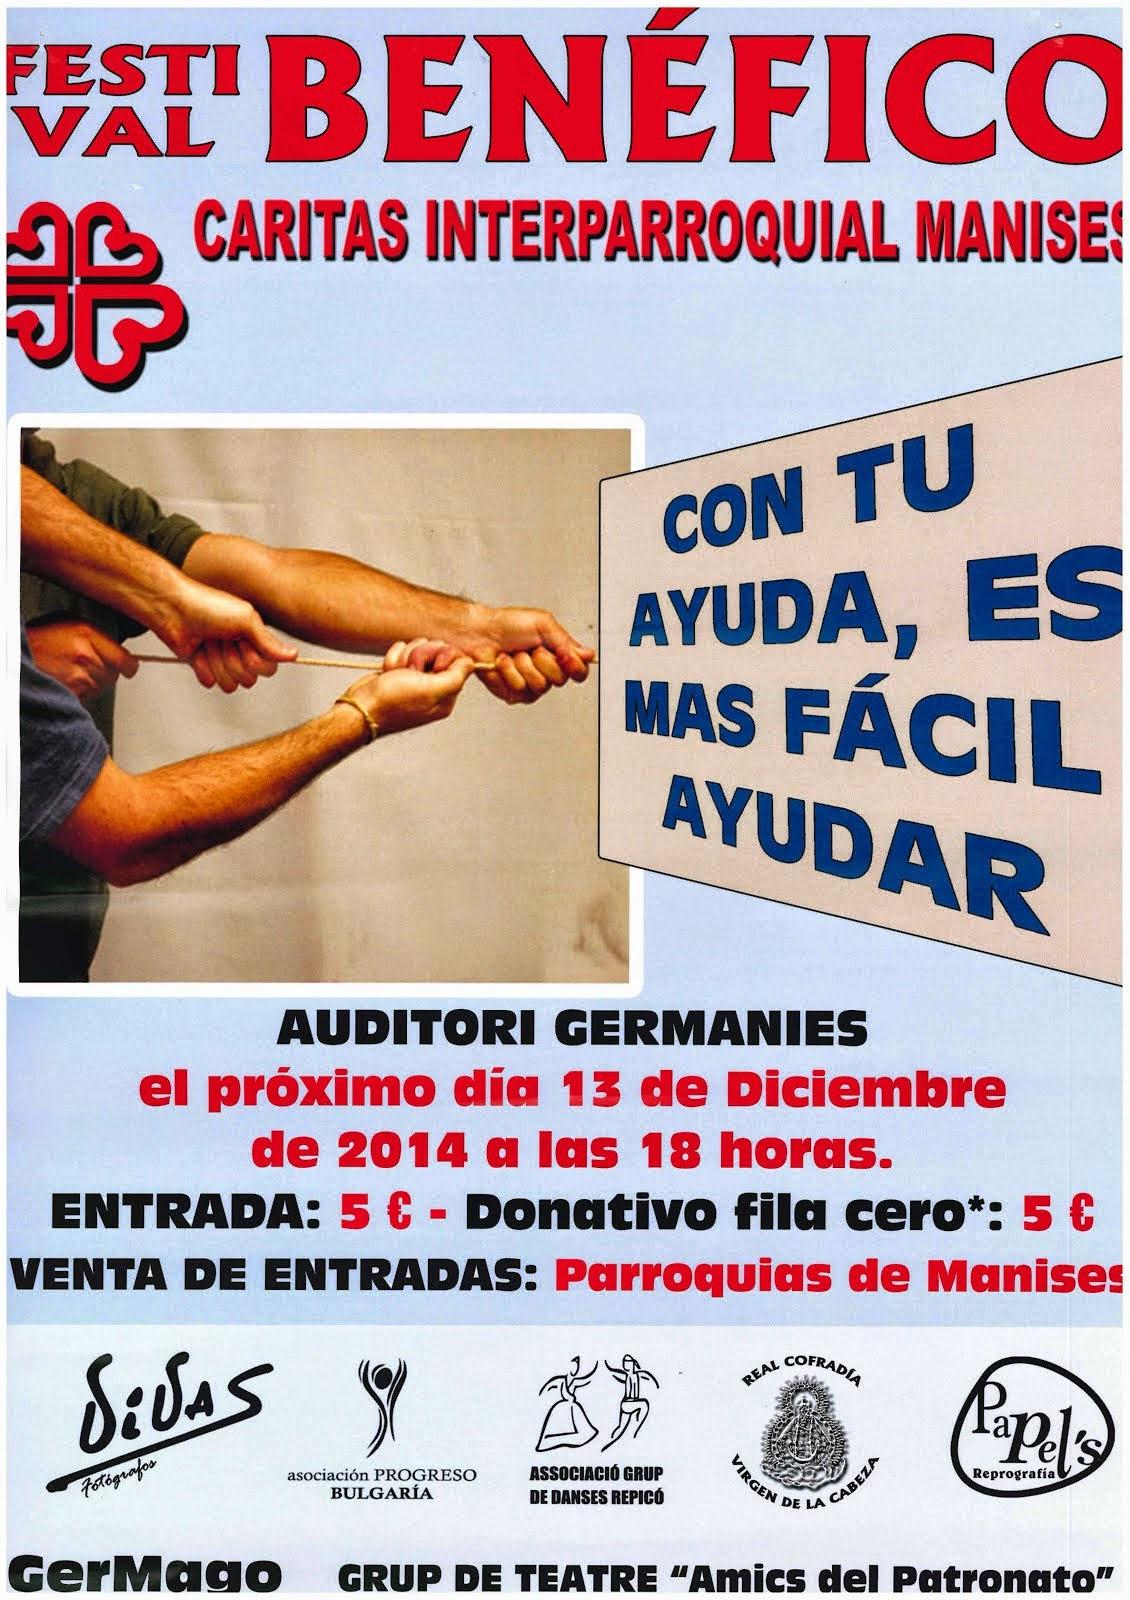 FESTIVAL DE CÁRITAS INTER- PARROQUIAL DE MANISES, 13.12.14.